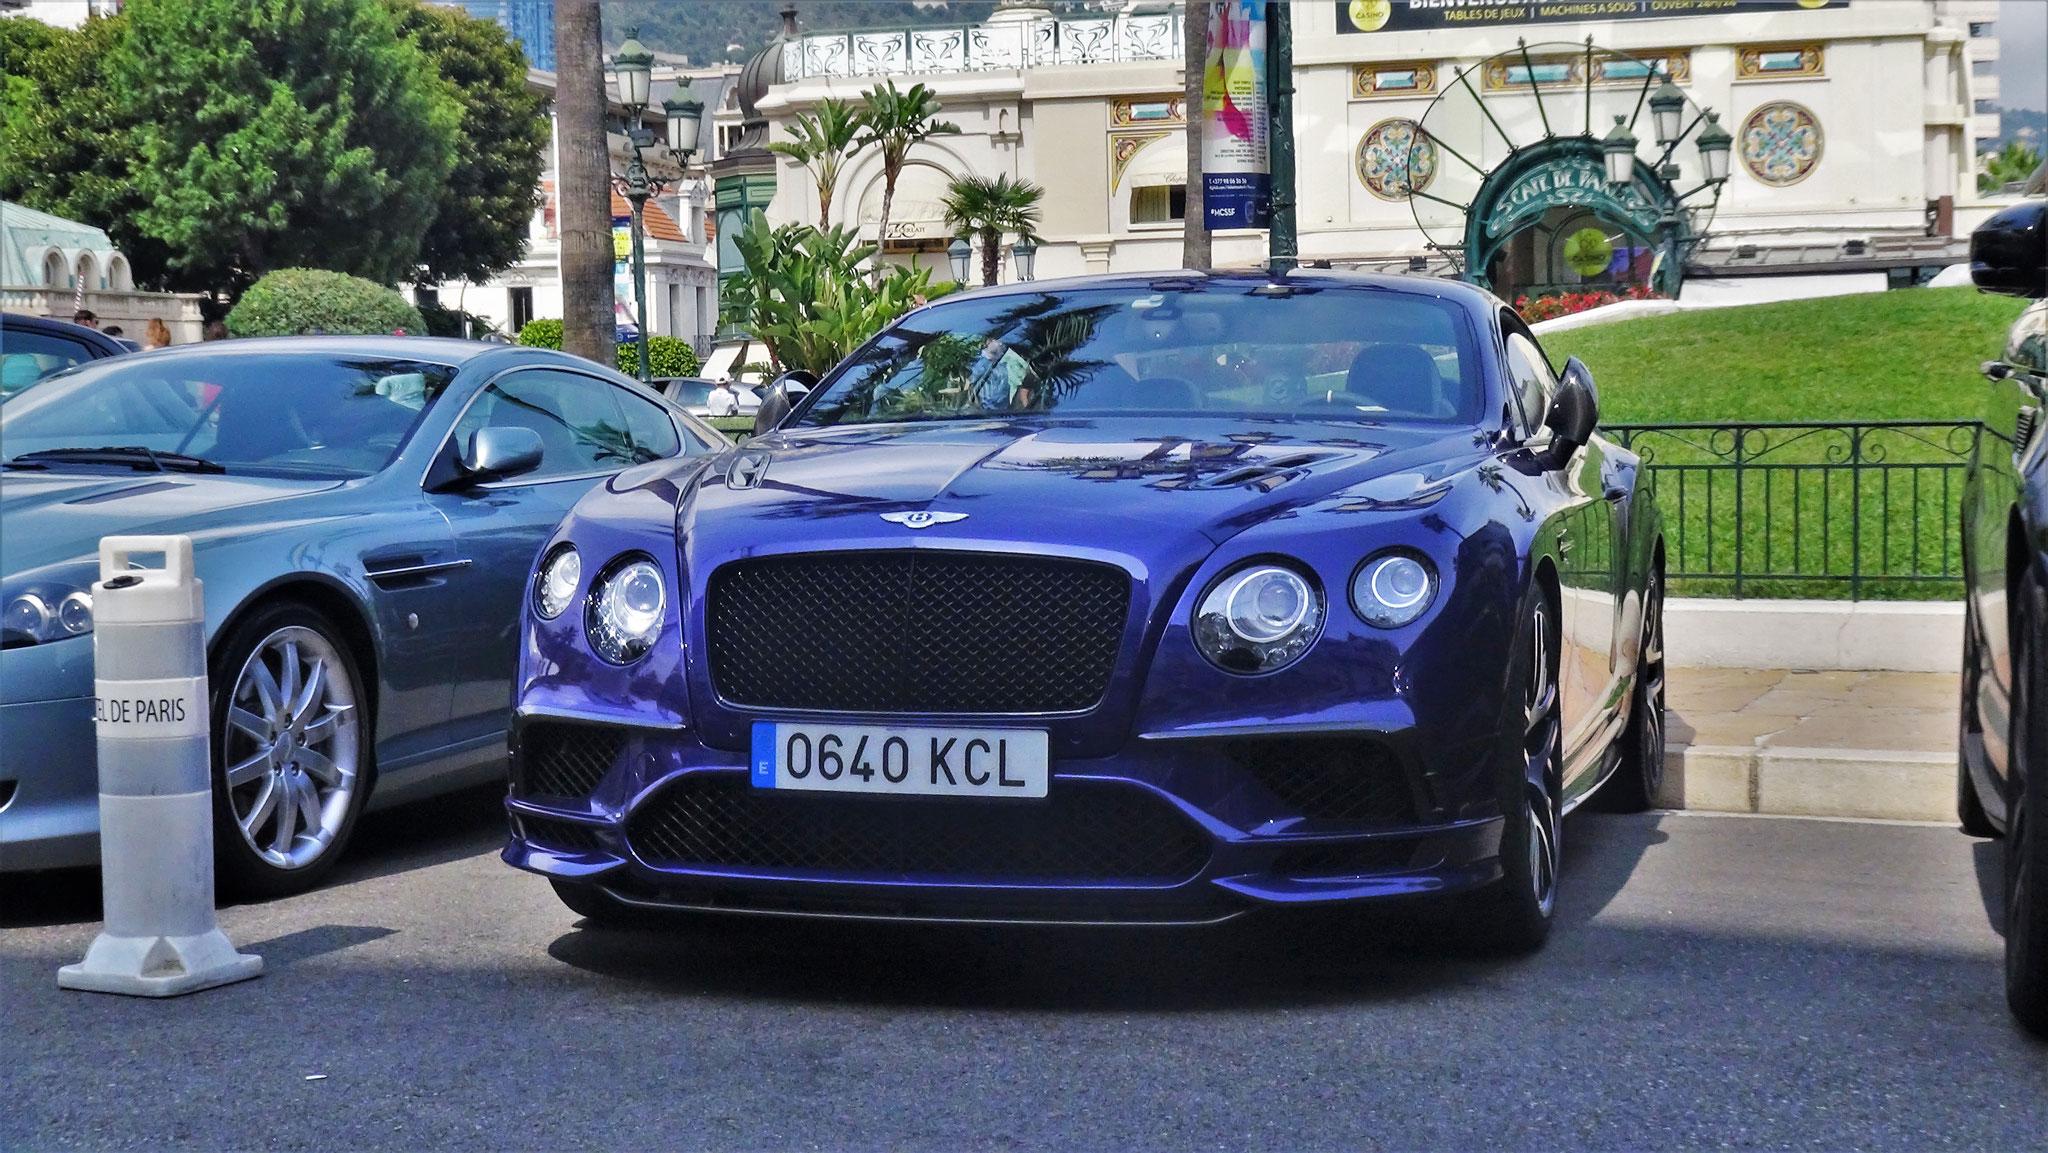 Bentley Continental GTC Supersports - 0640-KCL (ESP)